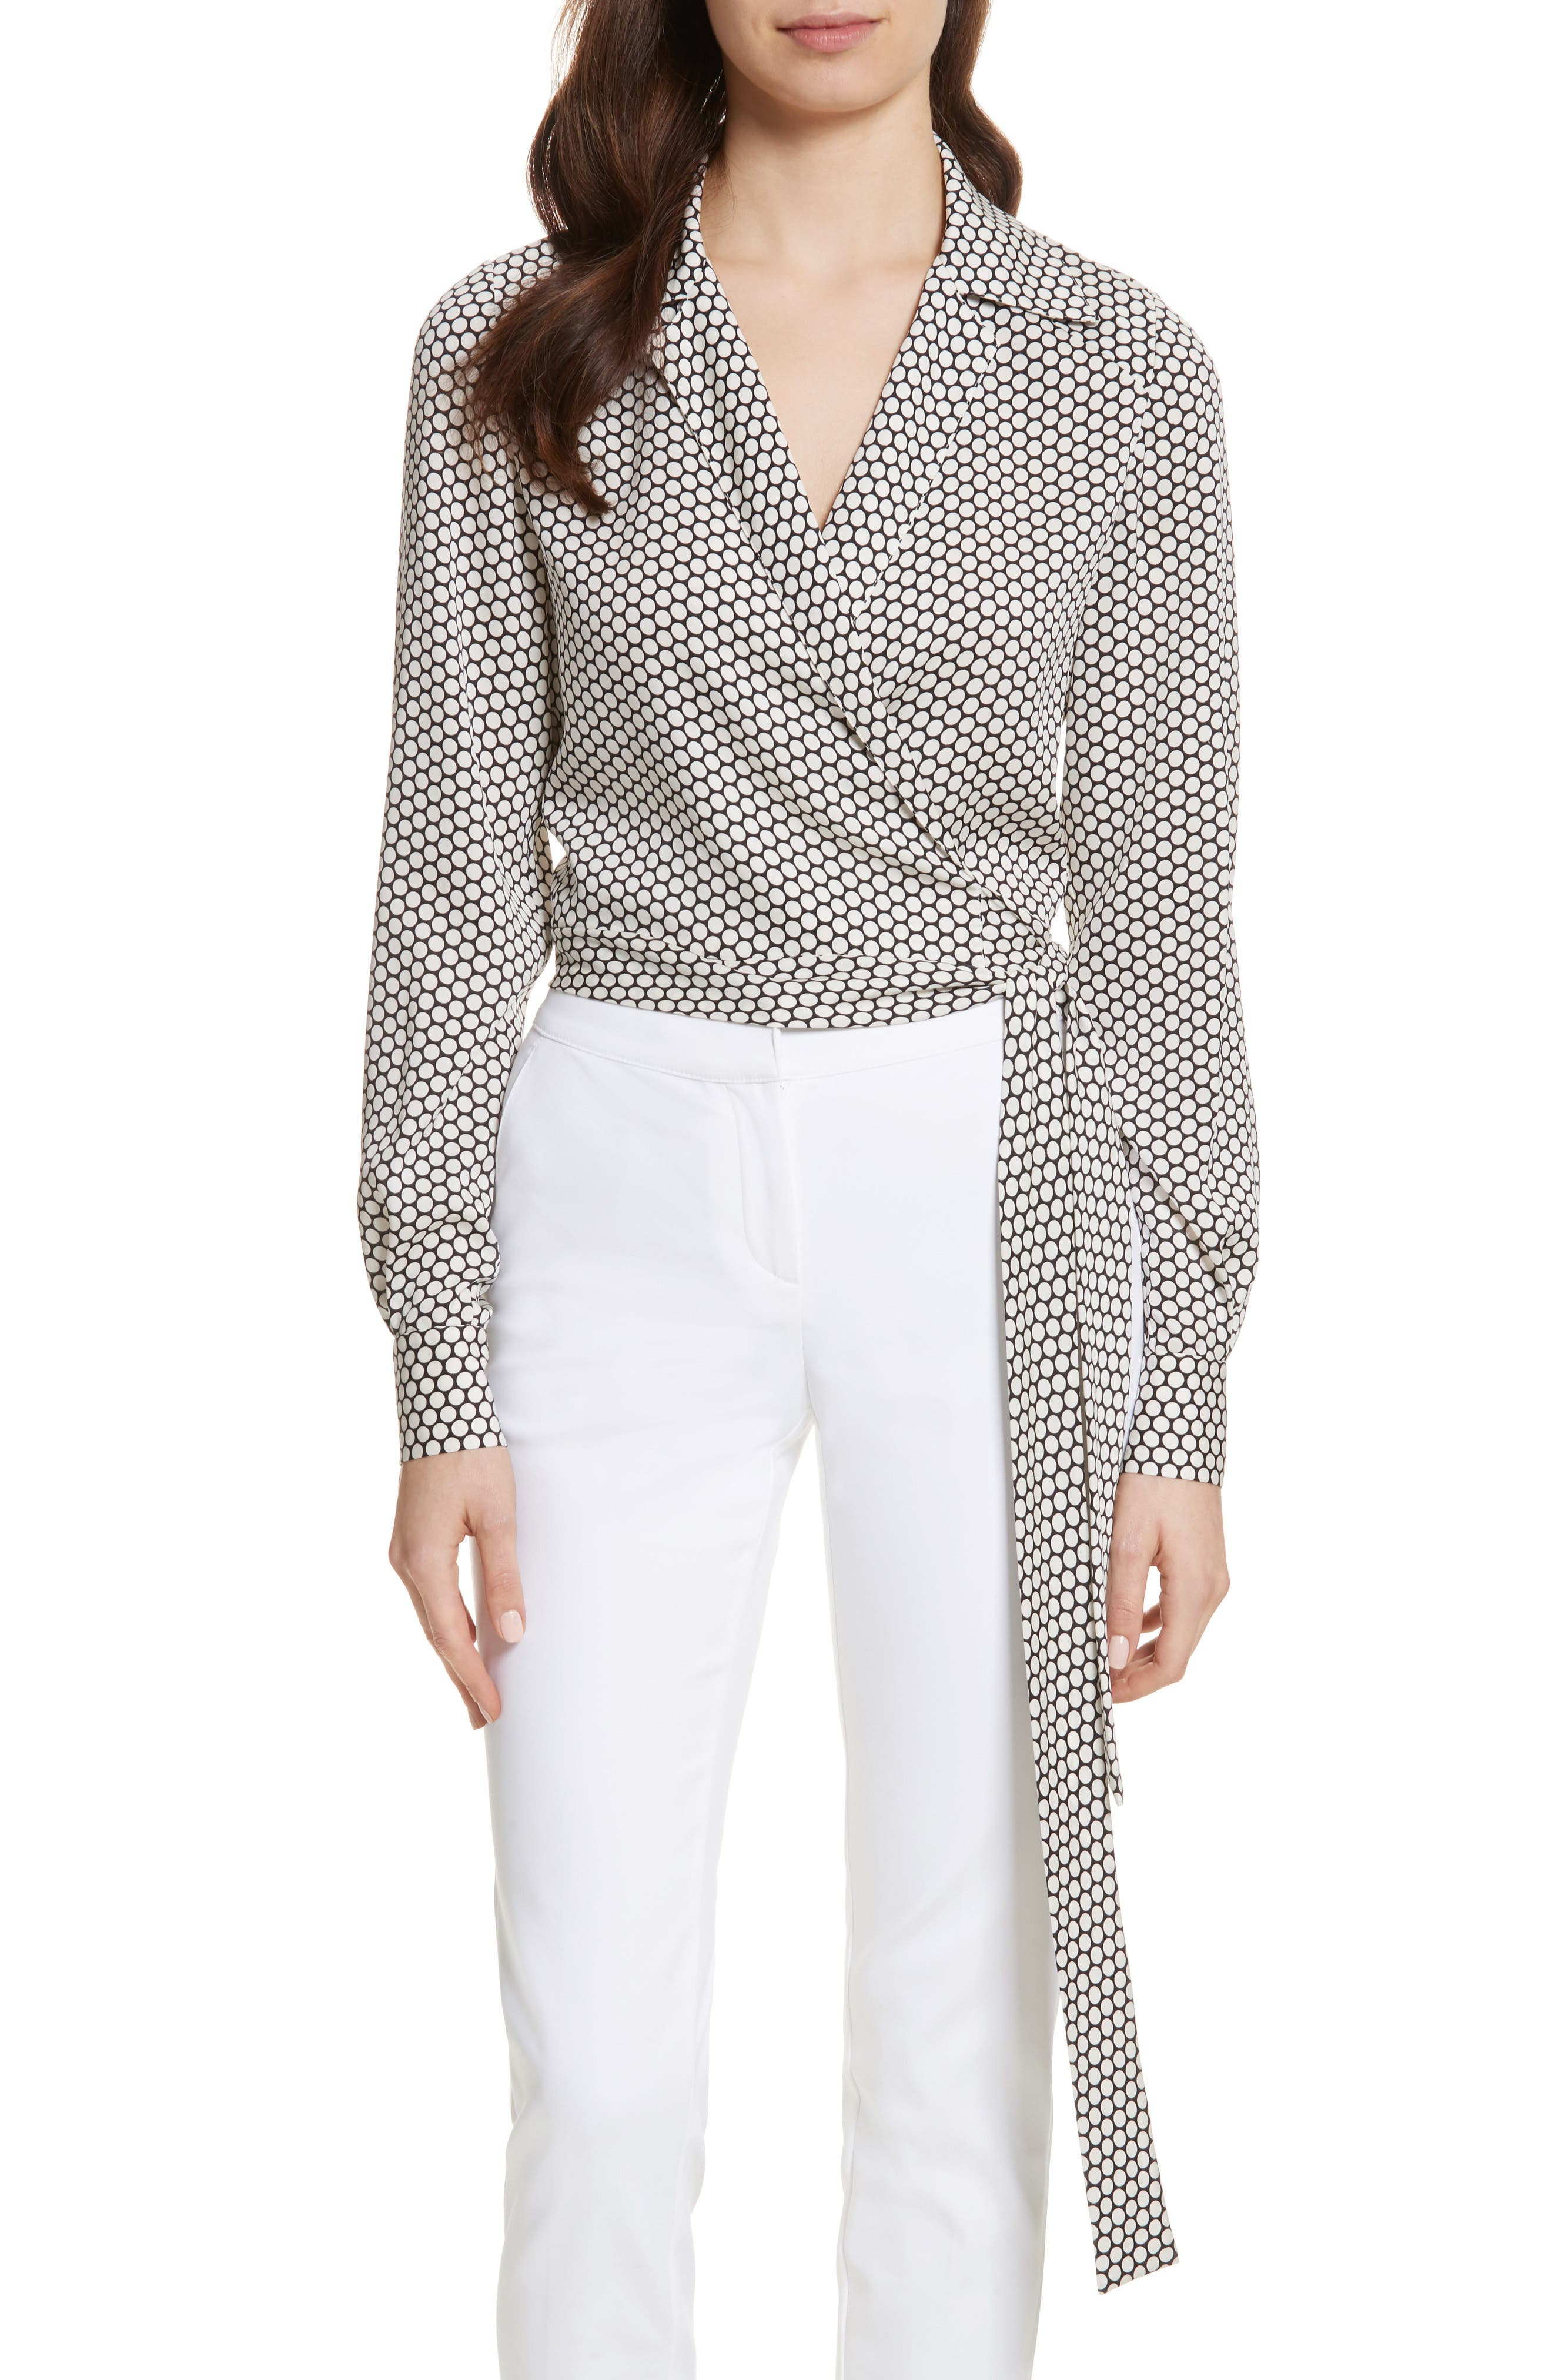 Alternate Image 1 Selected - Diane von Furstenberg Stretch Silk Wrap Blouse